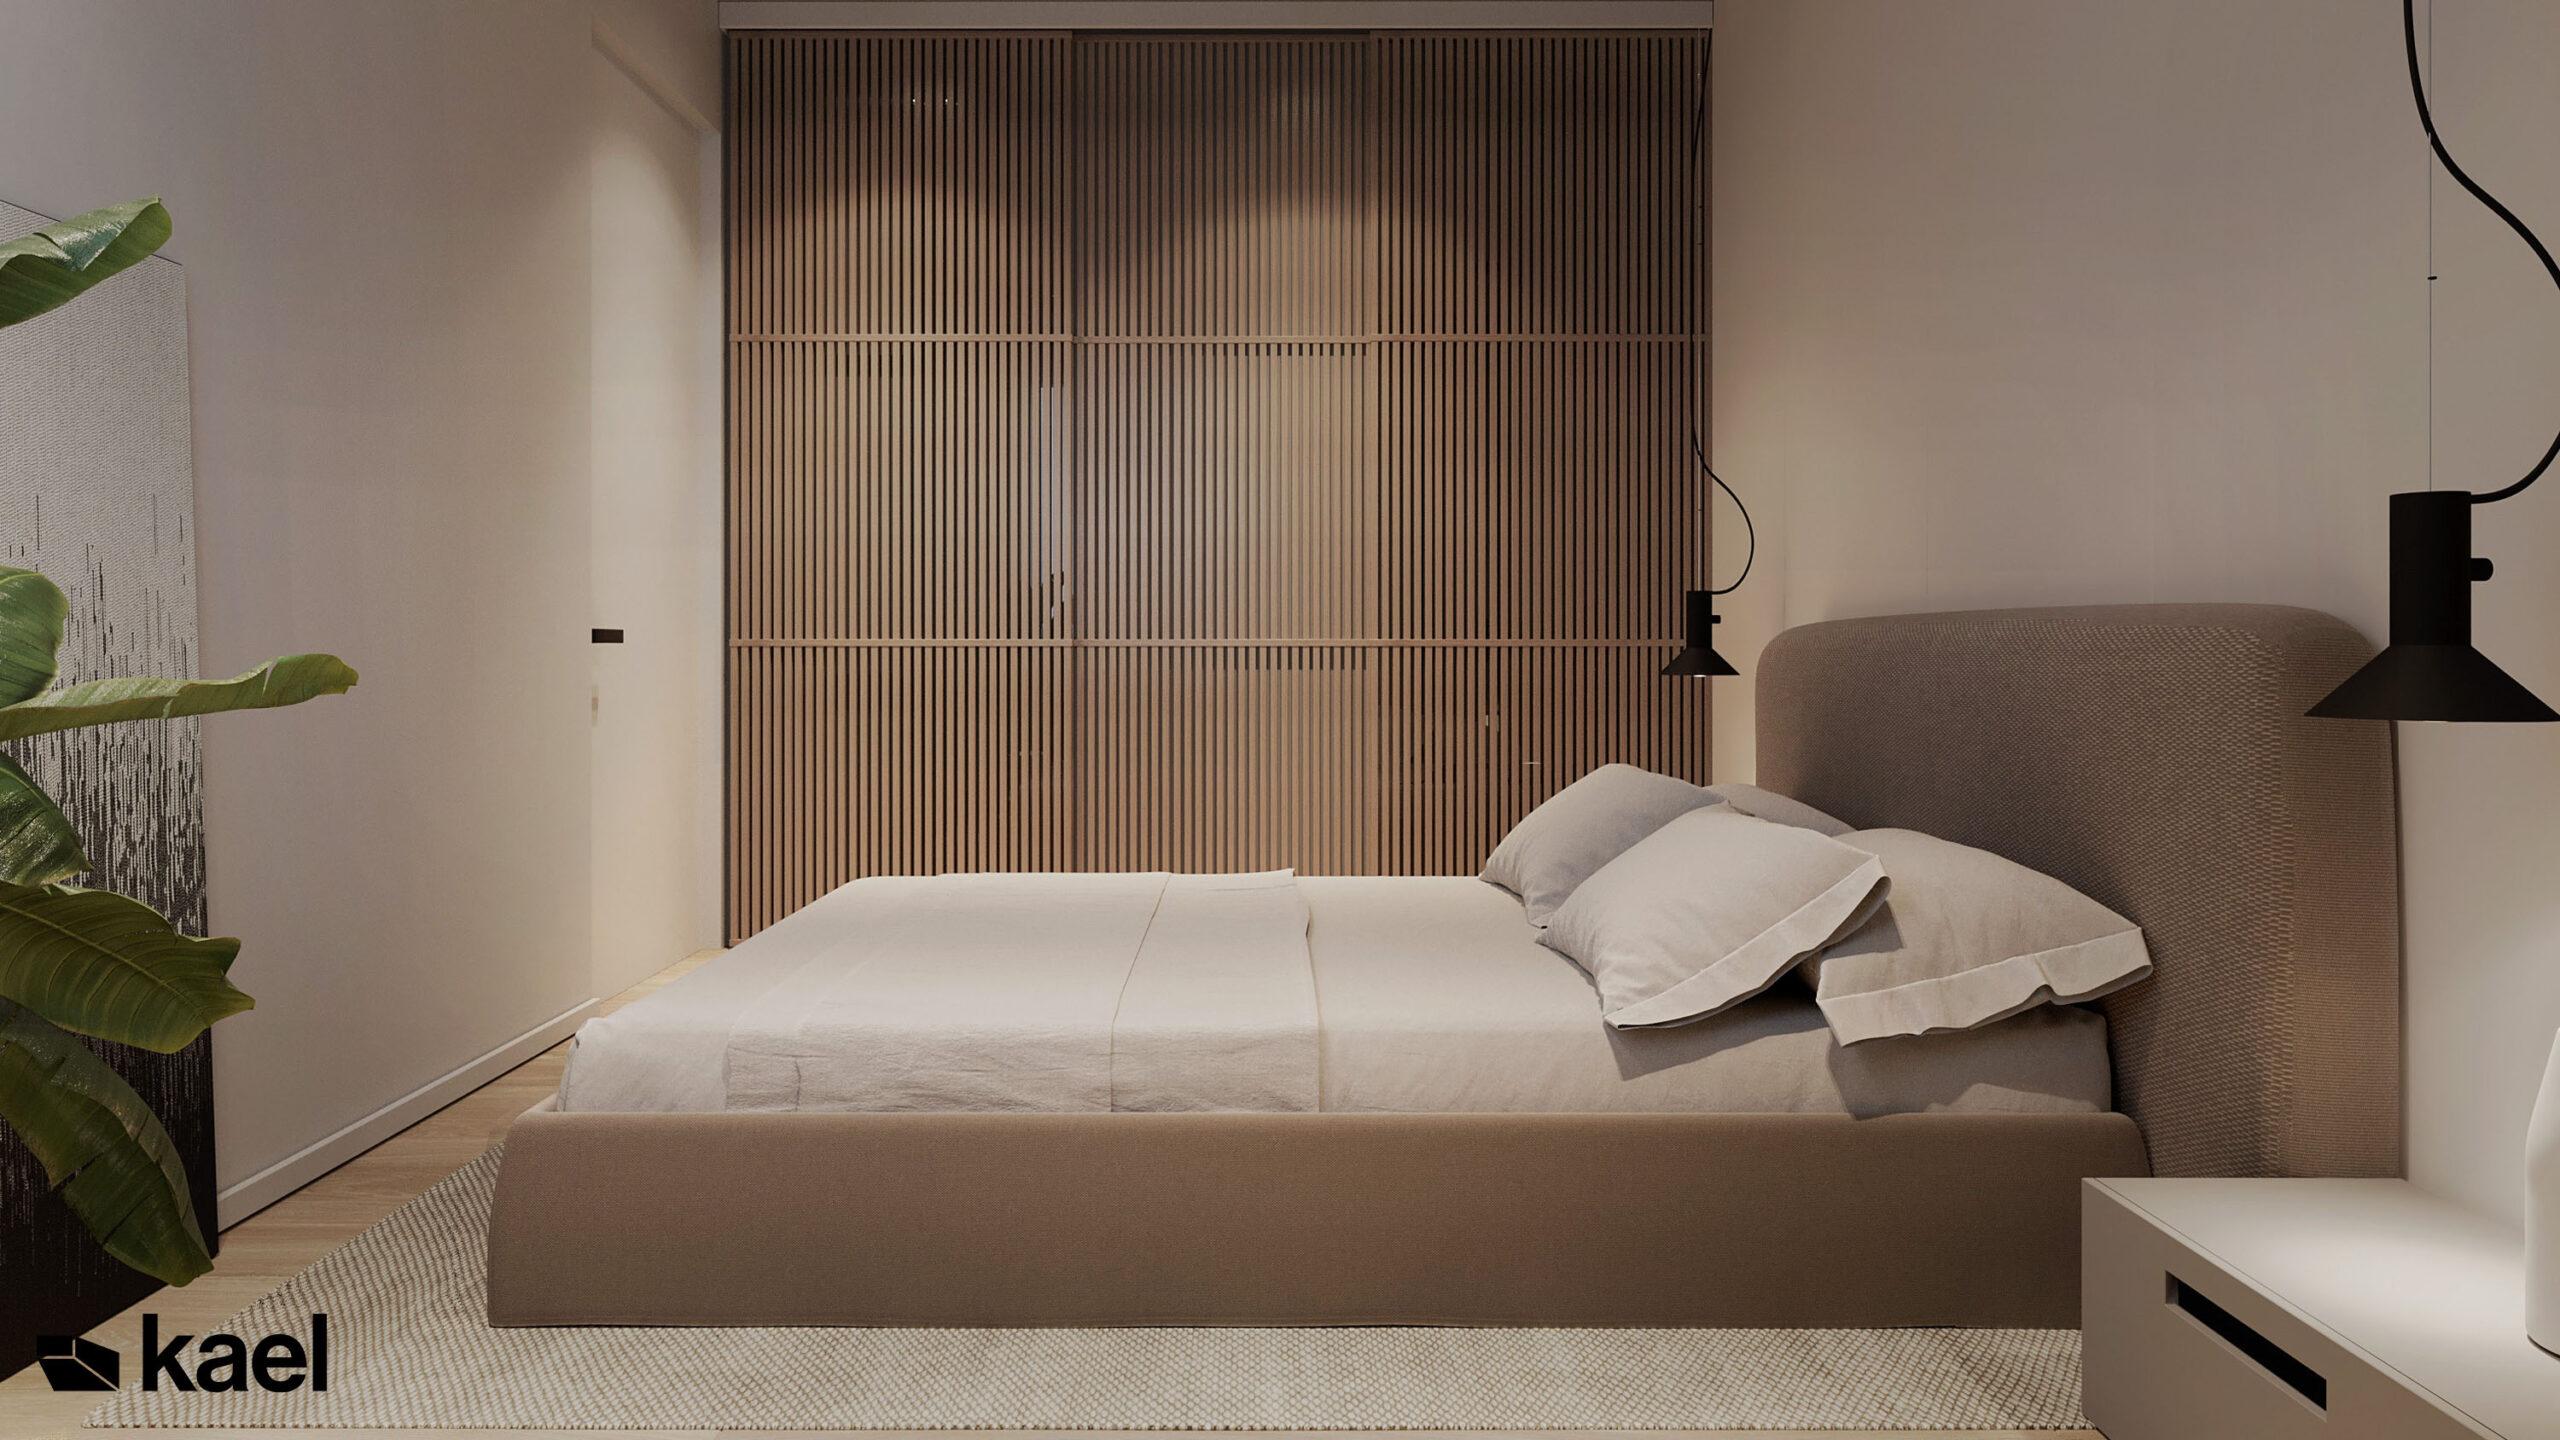 szafa za lamelkami w sypialni